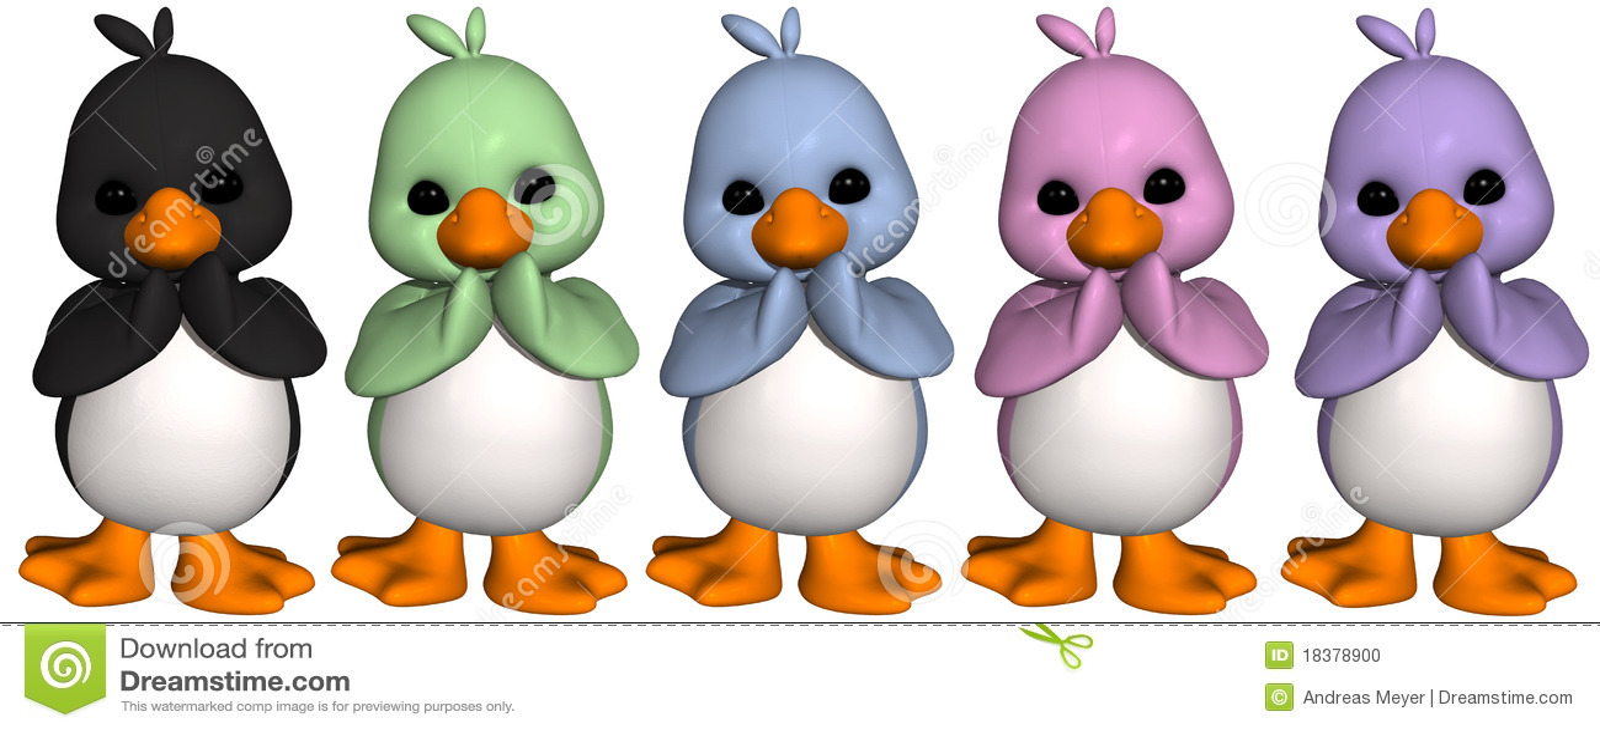 Penguin Toon